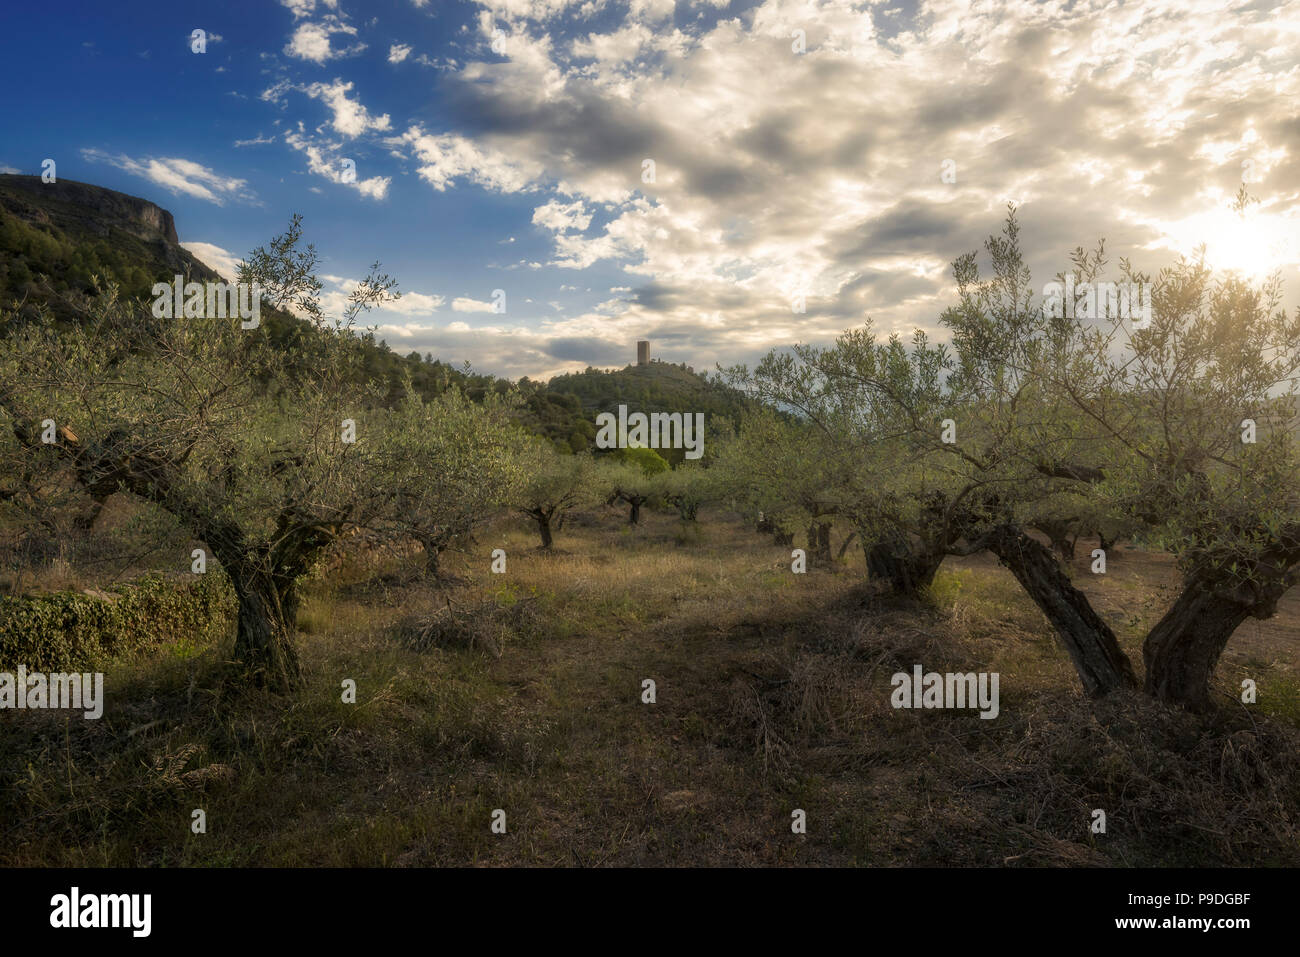 Olive trees in La Vall d'Almonacid (Castellon - Spain) - Stock Image